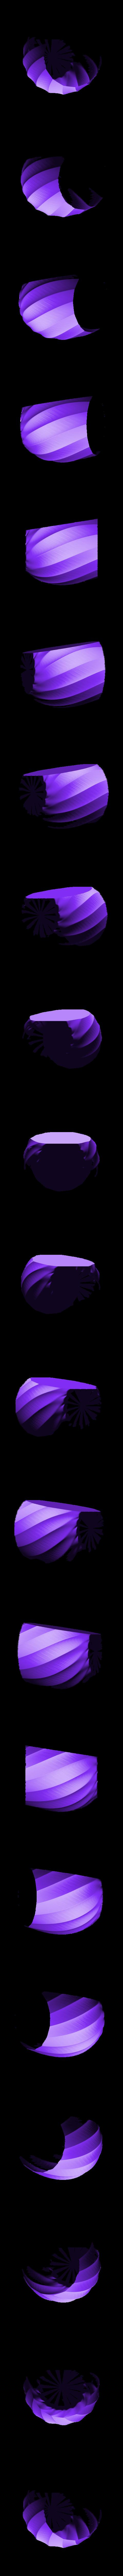 wallvase_fromtwistvase.stl Download STL file wallmounted flowerpot • 3D printing model, Pratrik